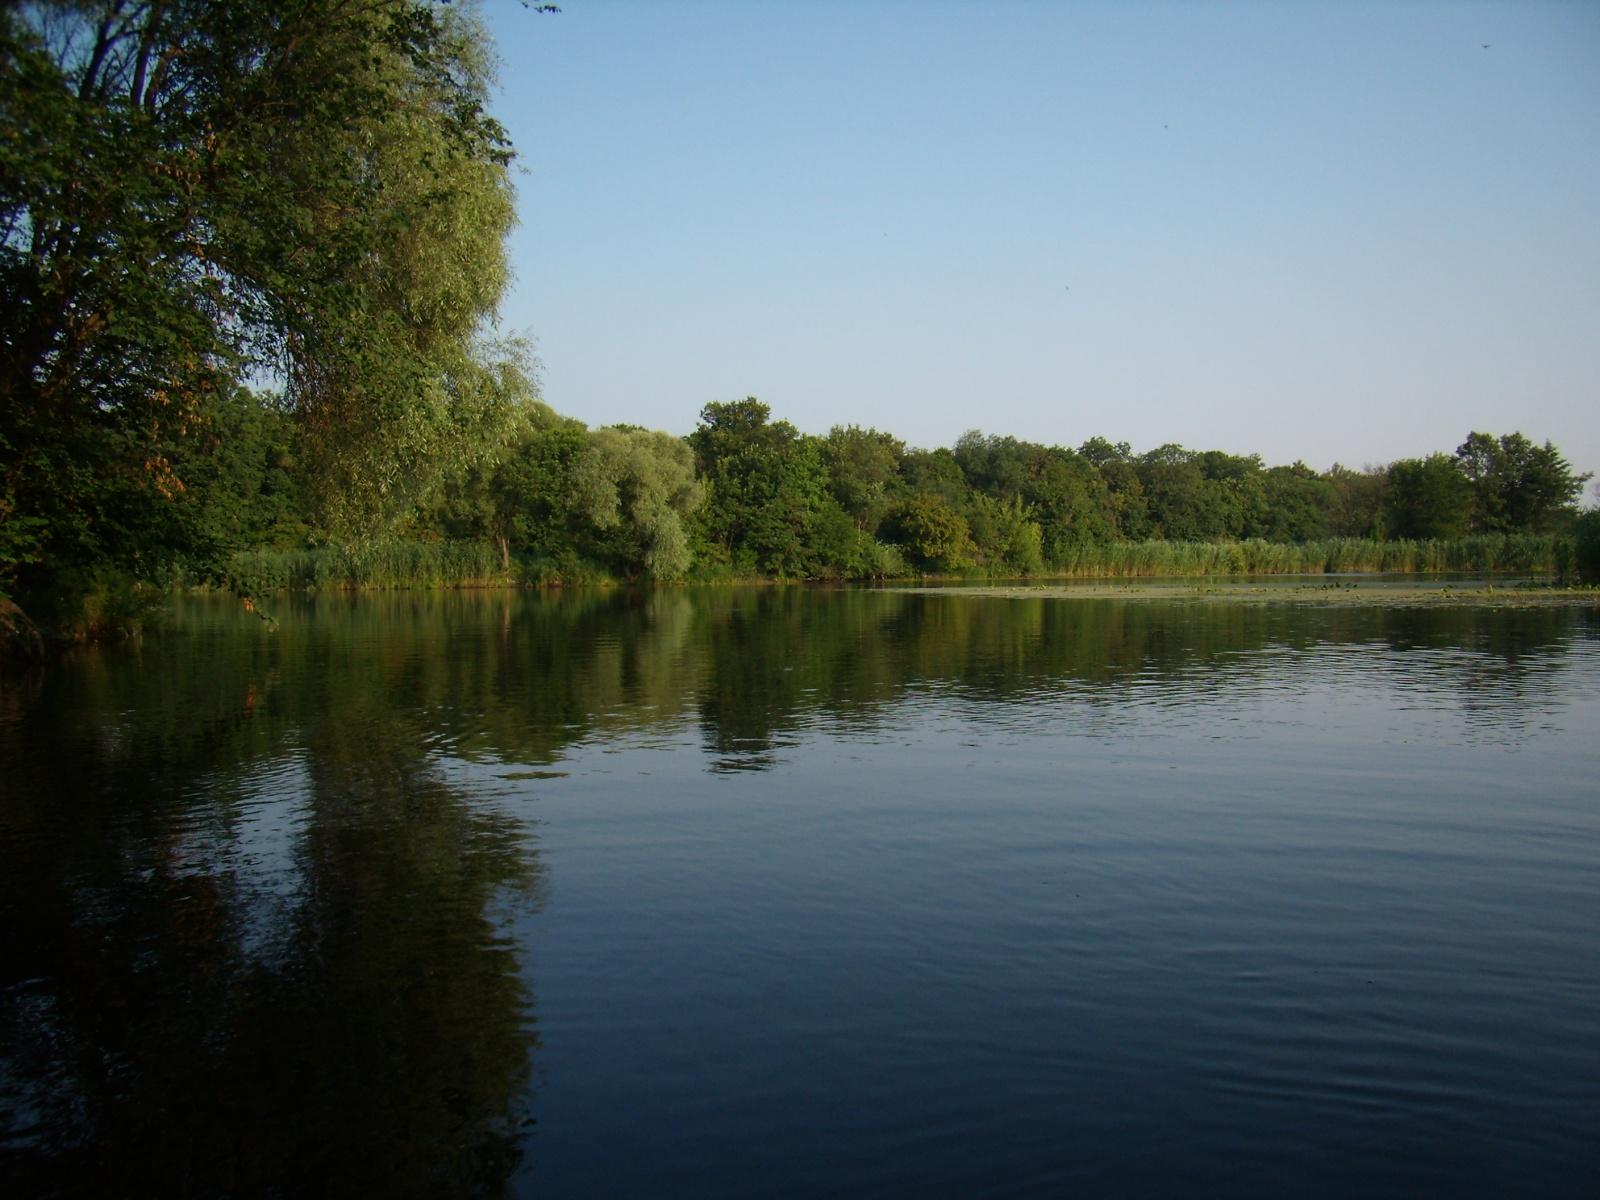 Тело без вести пропавшей пенсионерки нашли на берегу реки